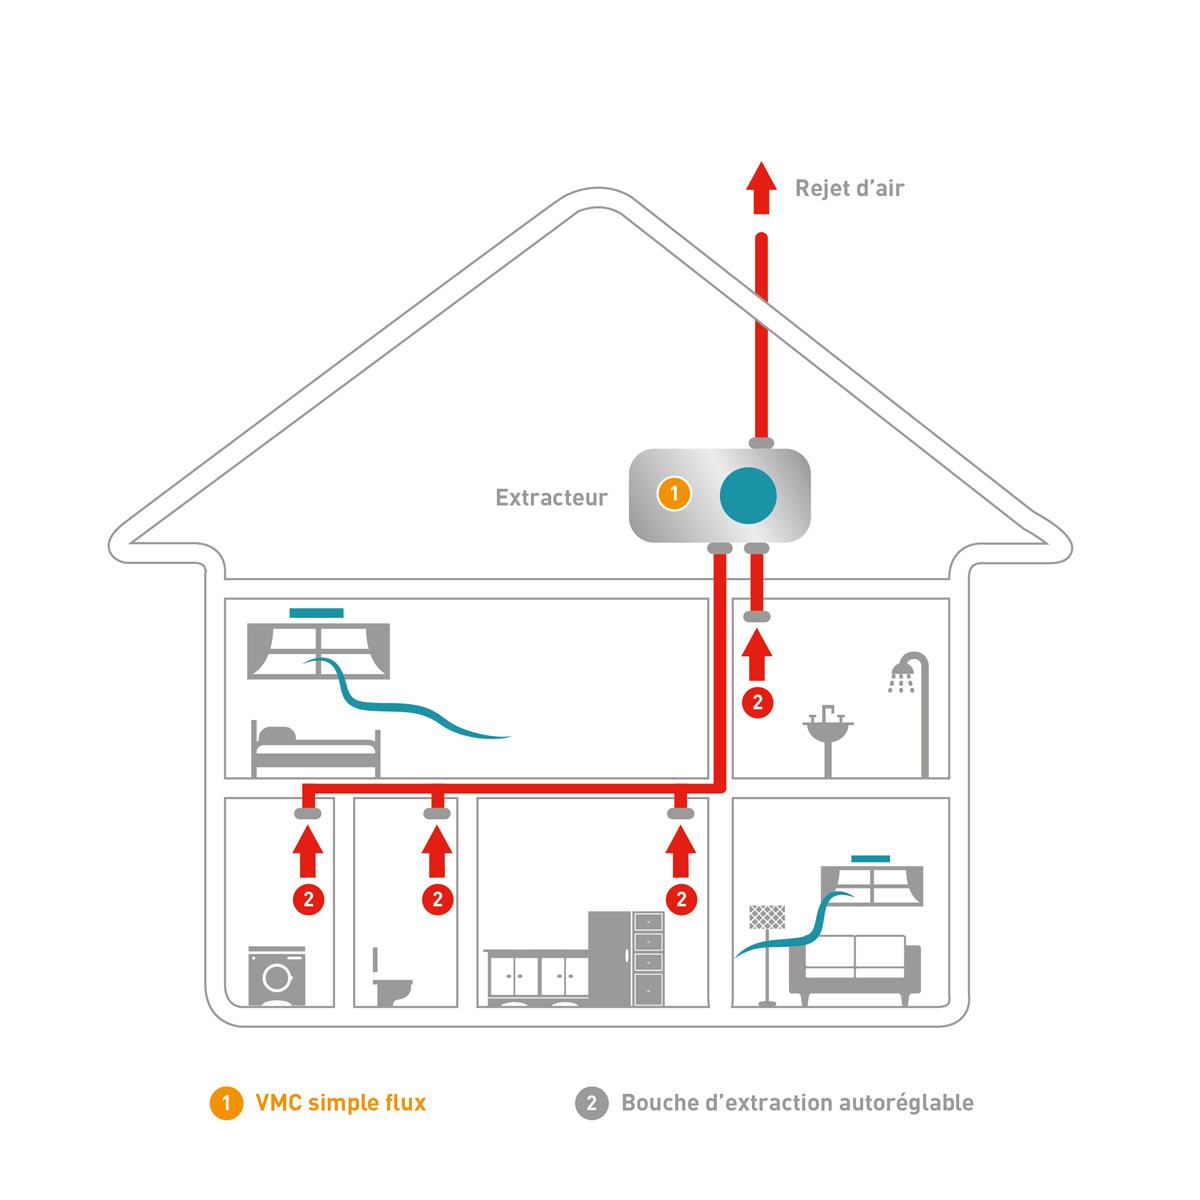 Ventilation m canique contr l e vmc simple flux for Ventilation simple flux hygroreglable